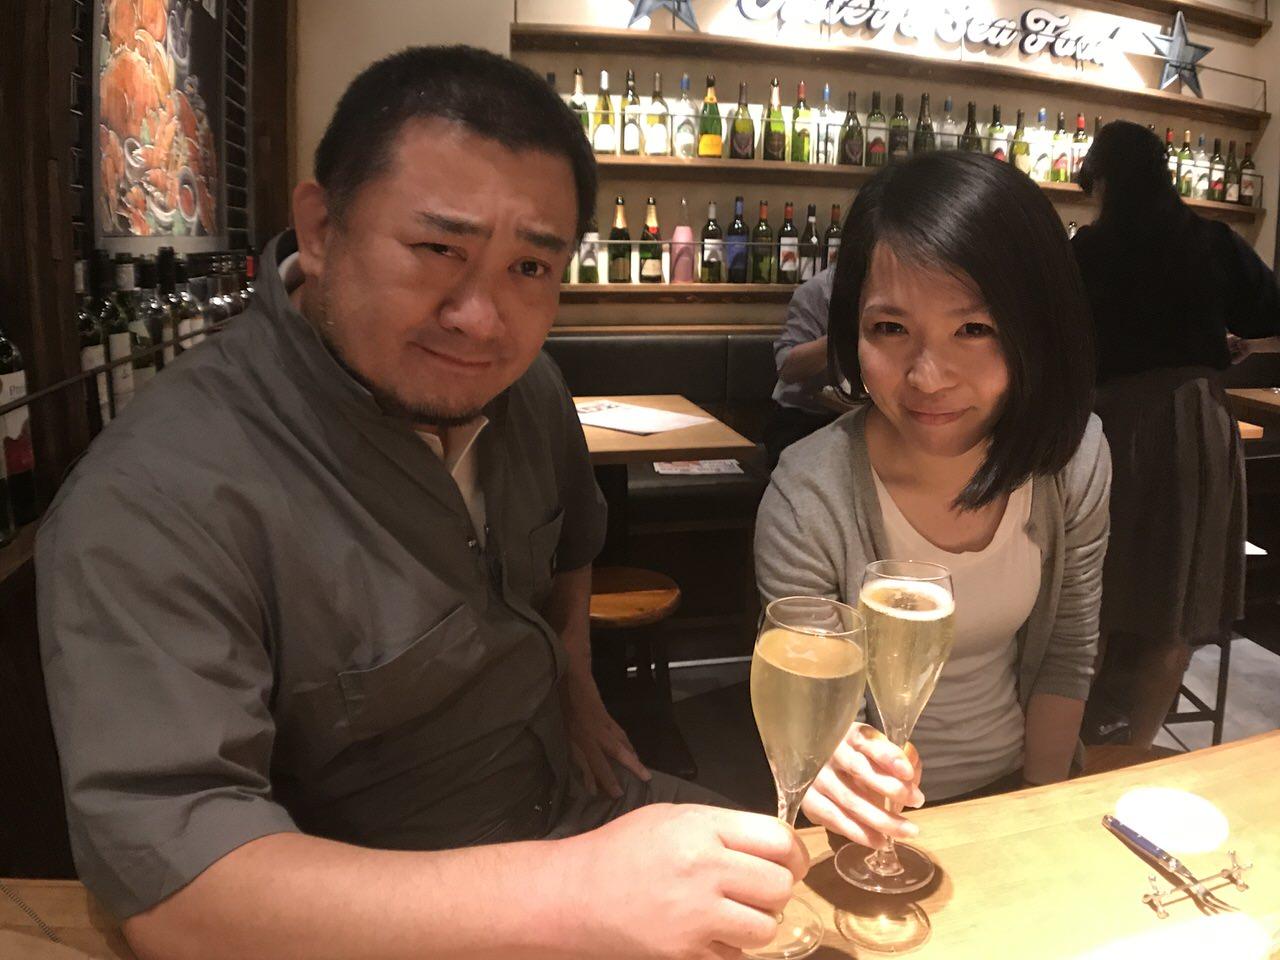 Shinjuku nishiguchi oyster bar 3206